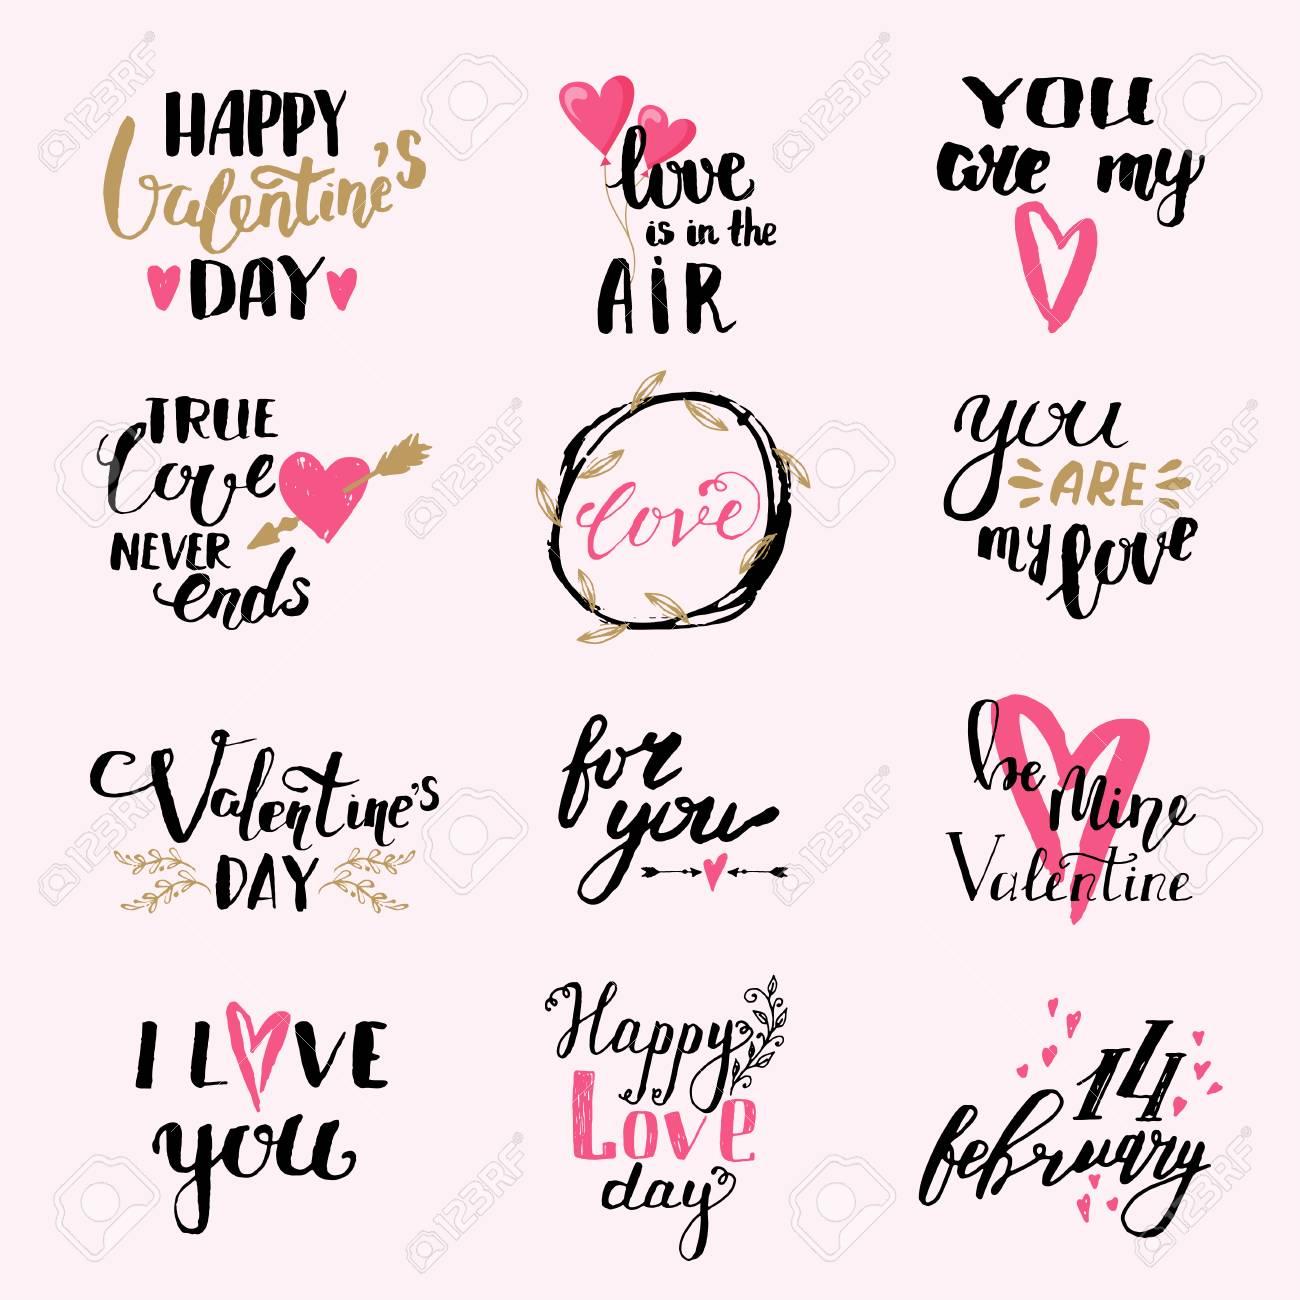 I Love You Frases Conjunto De Vectores De Diseño De Impresión De San Valentín